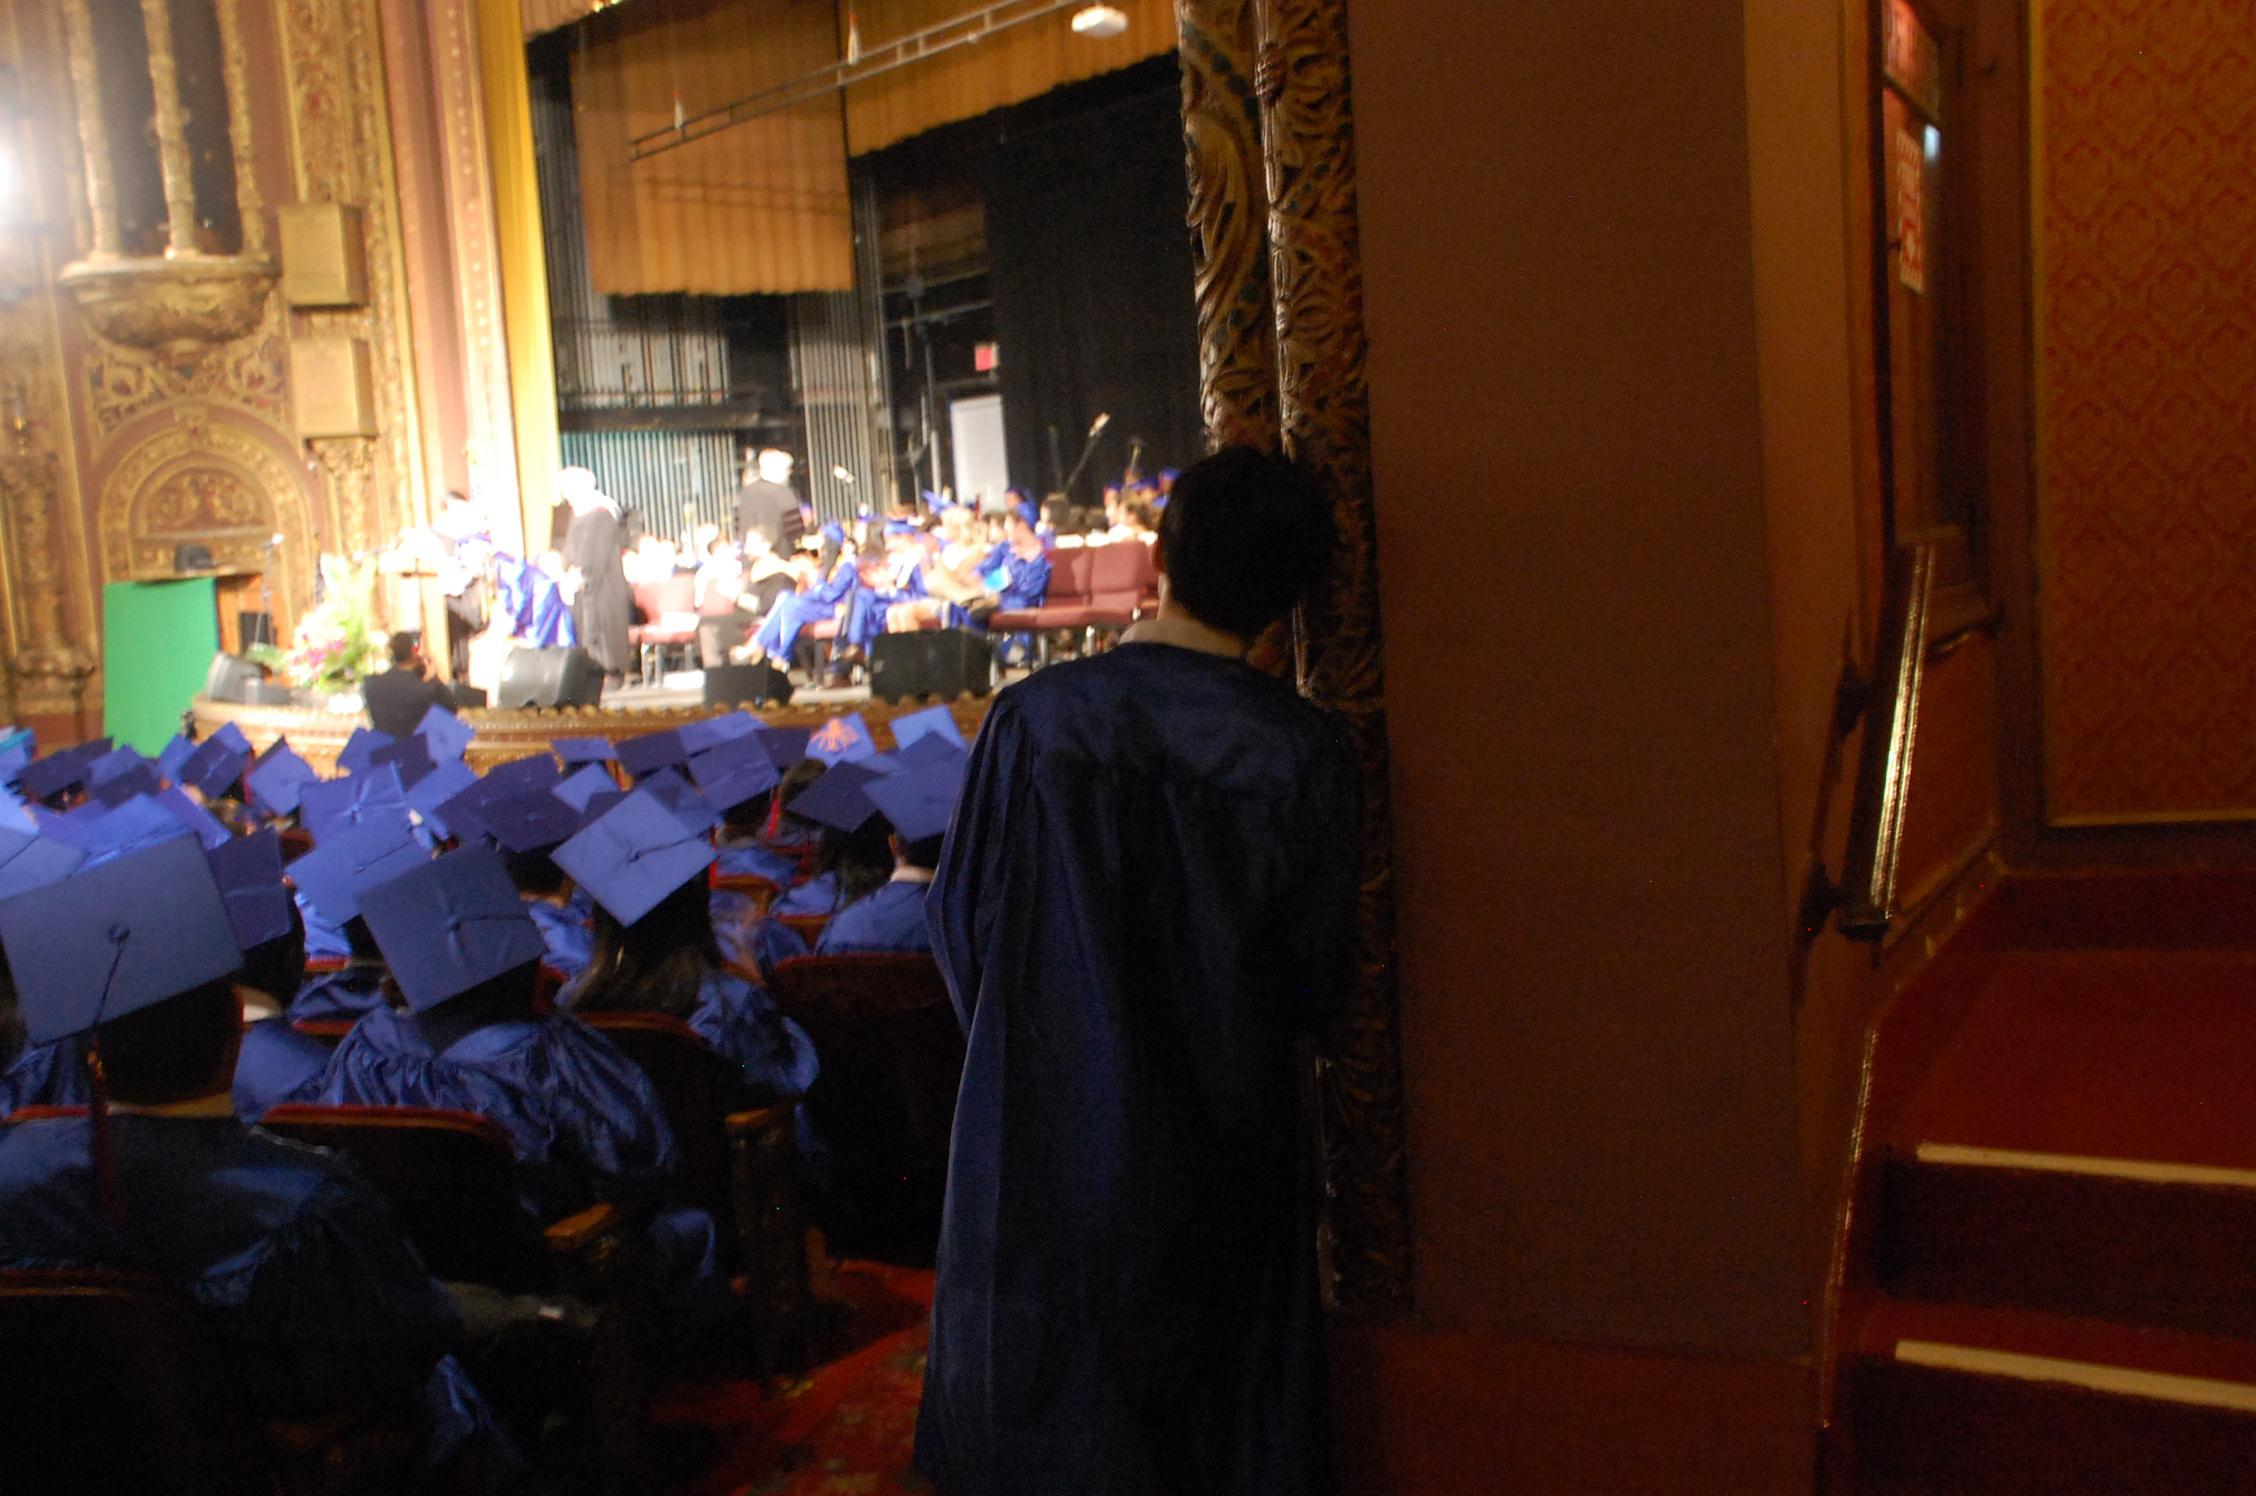 Stuyvesant High School Sing 2014 Stuyvesant High School Insideschools Shsat Exam Prep Tutors